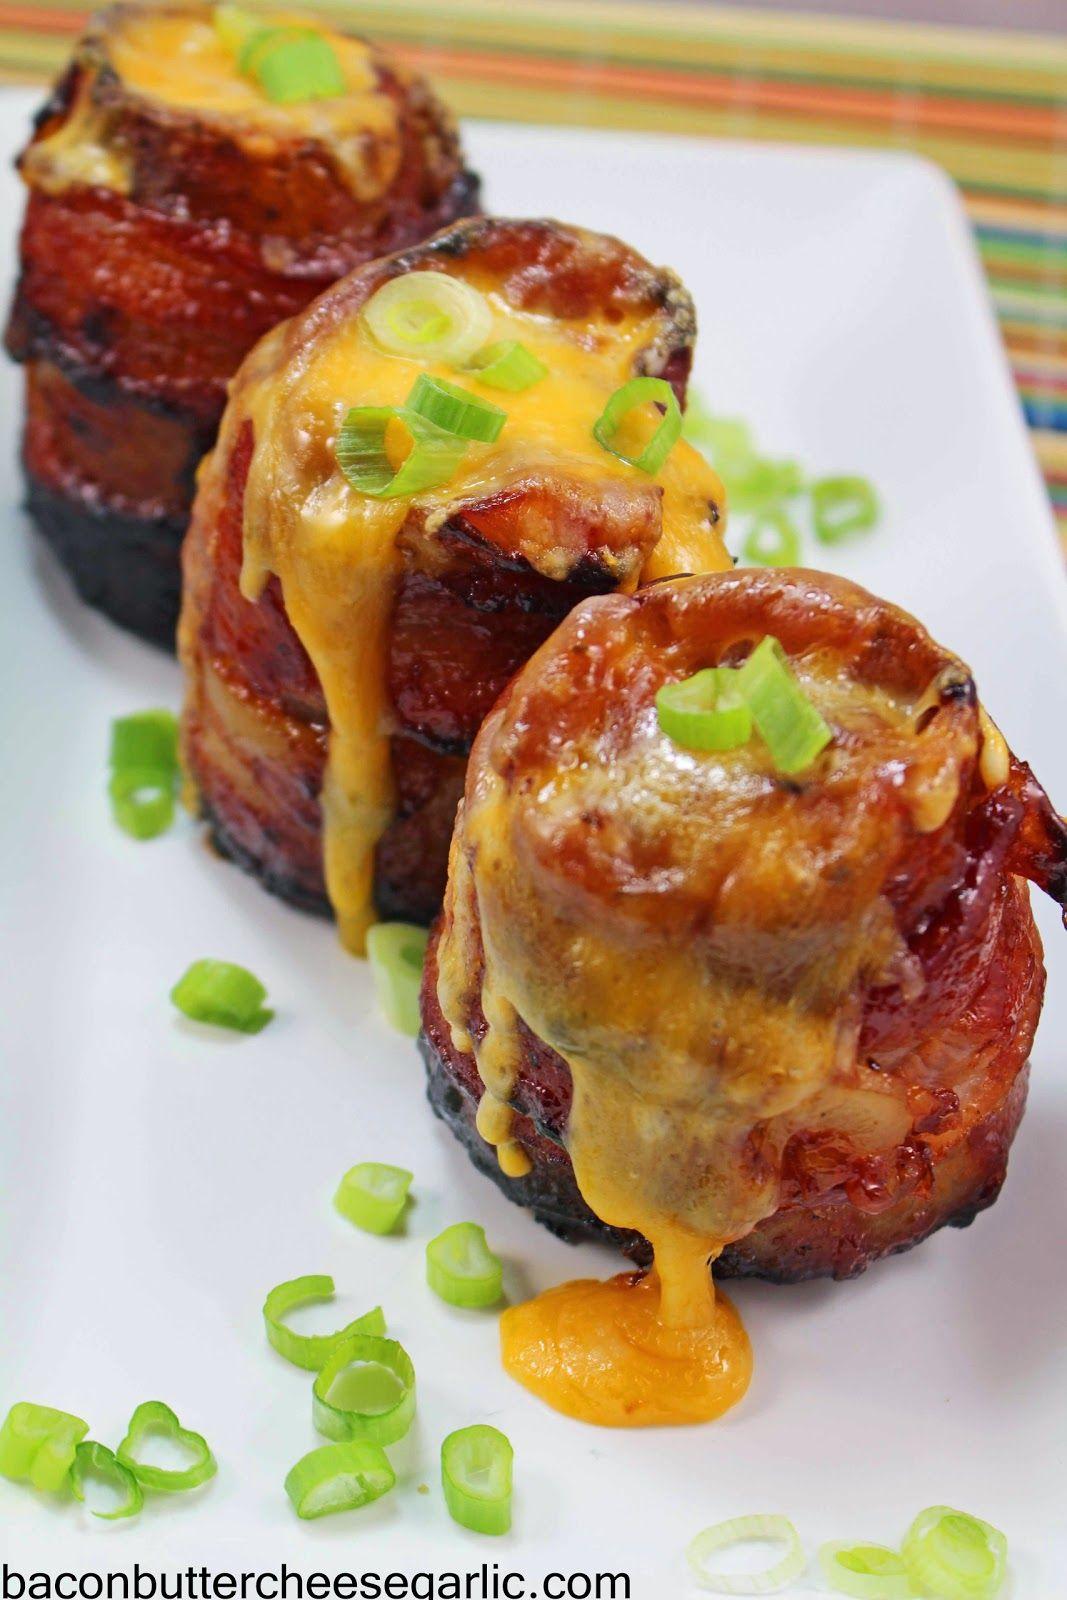 bacon butter cheese garlic volcano potatoes yummy pinterest potatoes volcano. Black Bedroom Furniture Sets. Home Design Ideas